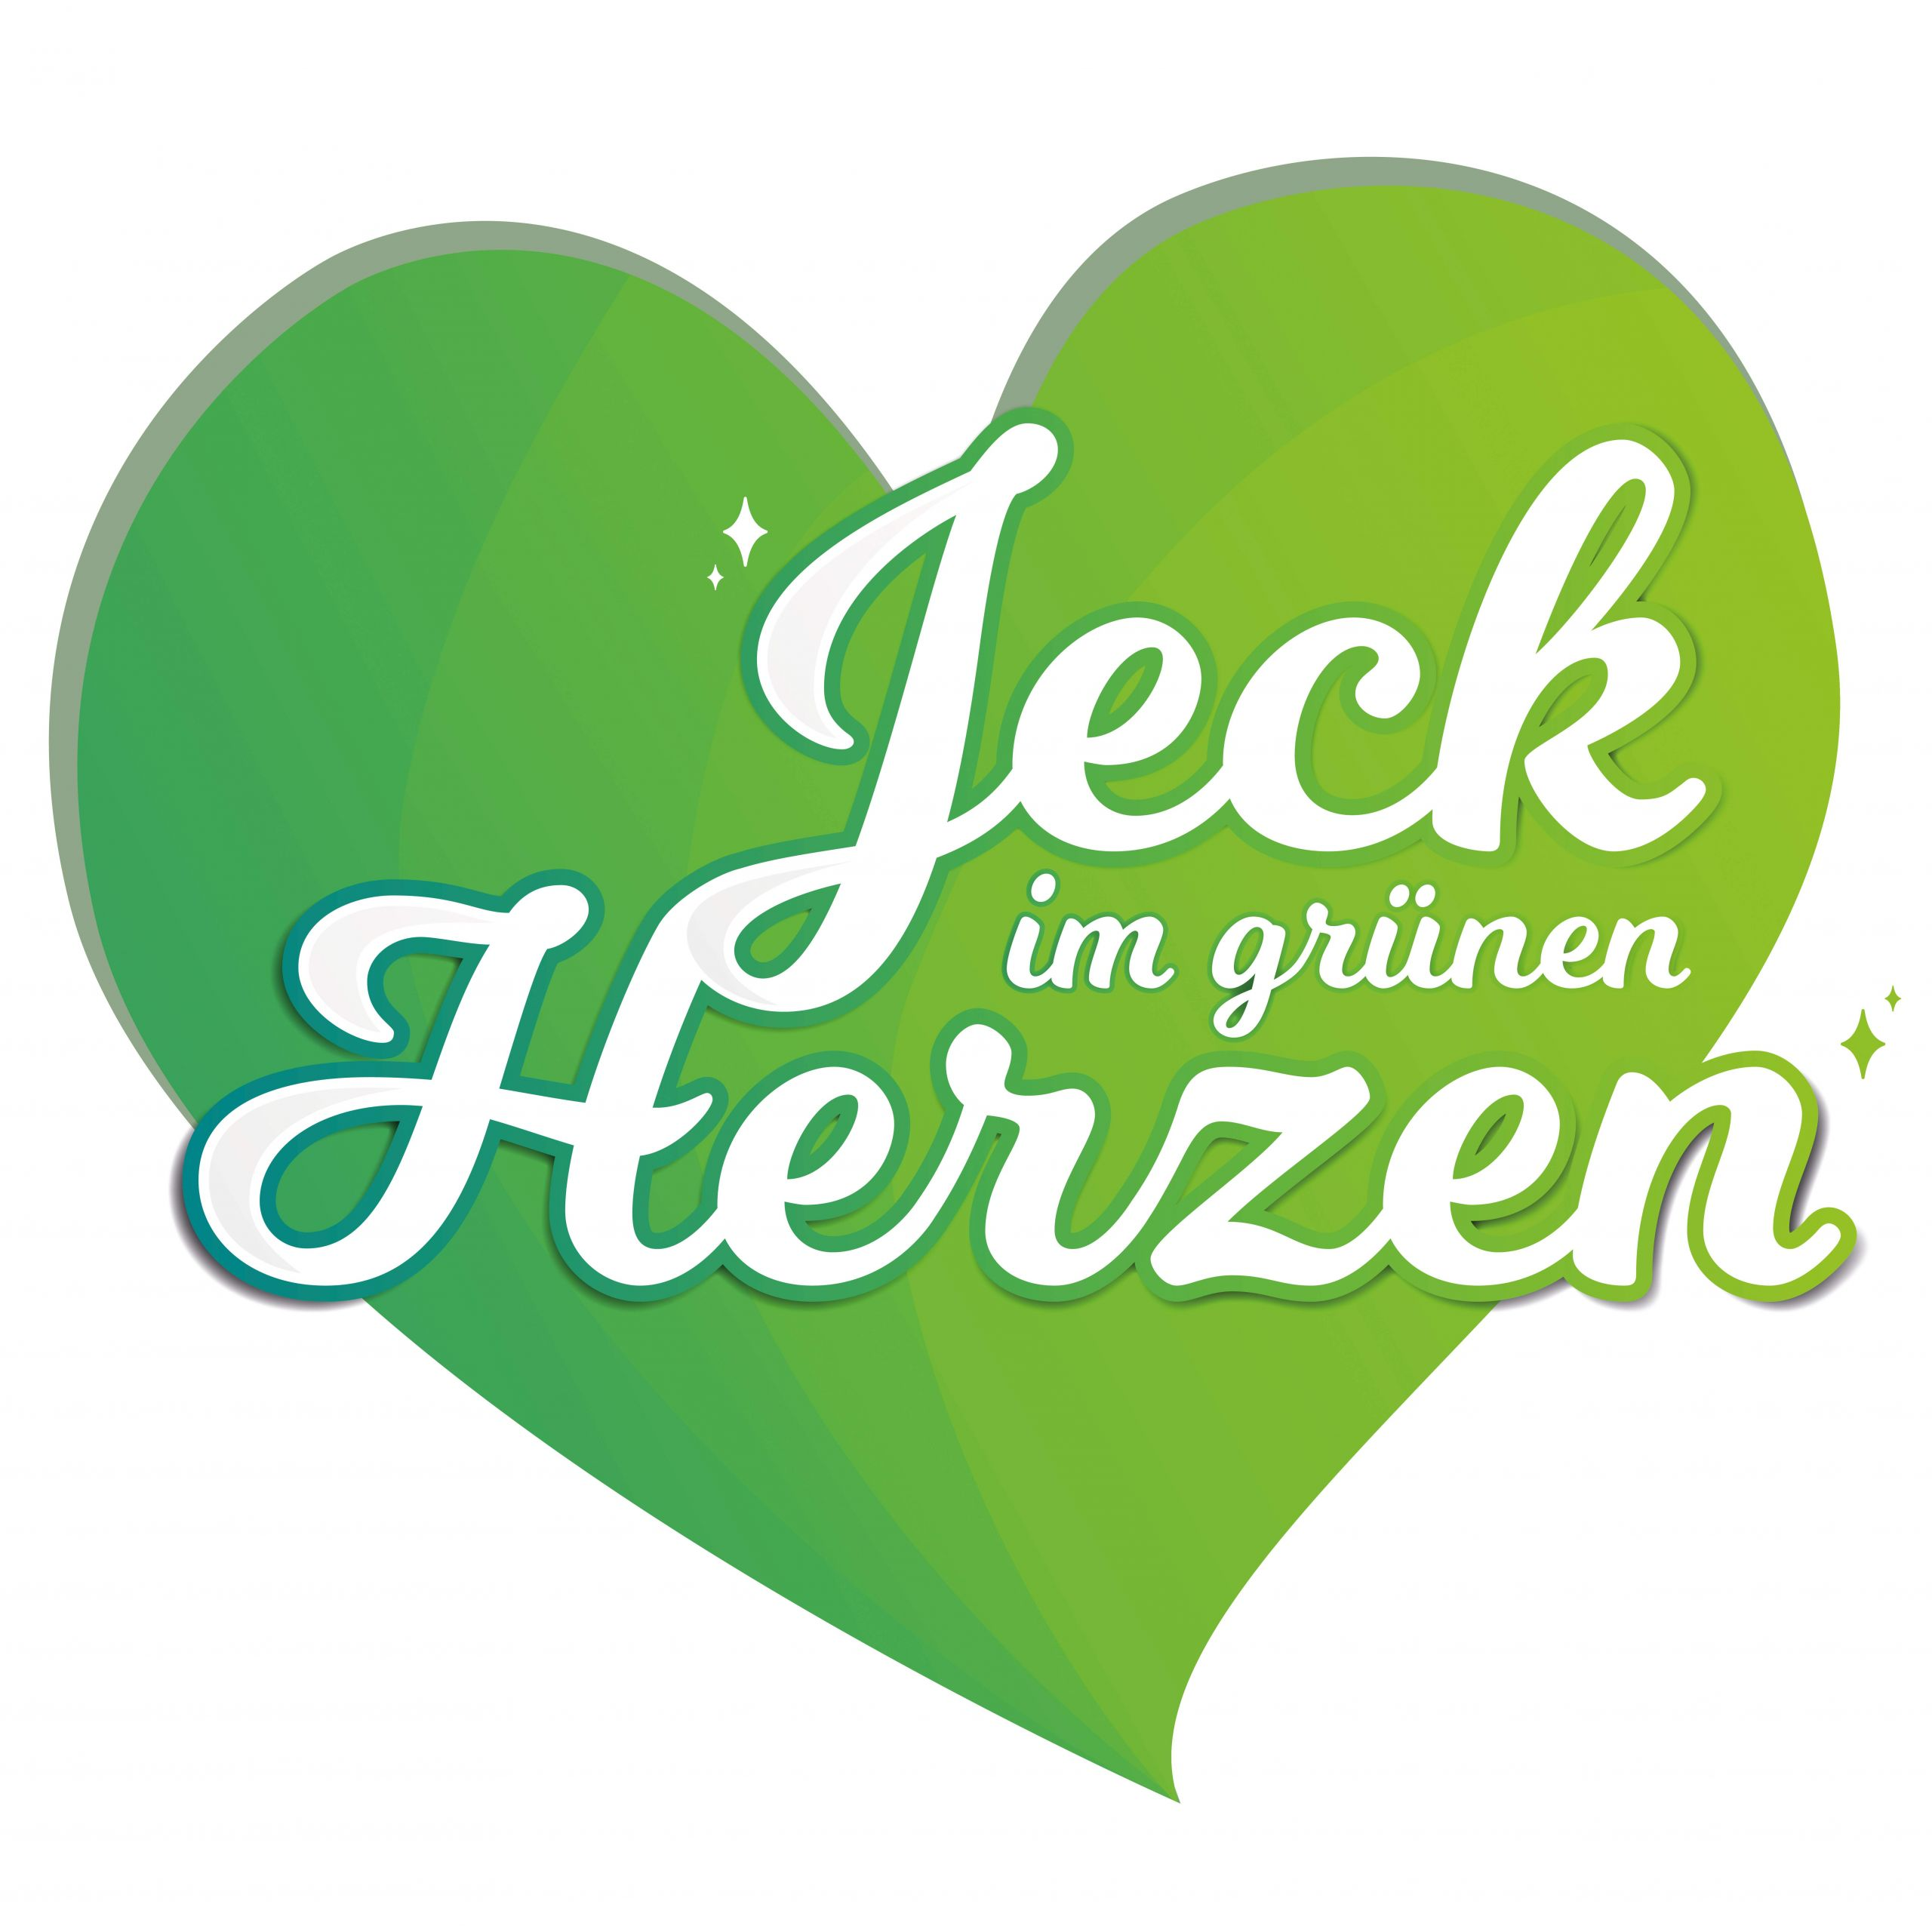 v 01 Jeck im gruenen Herzen Logo 01